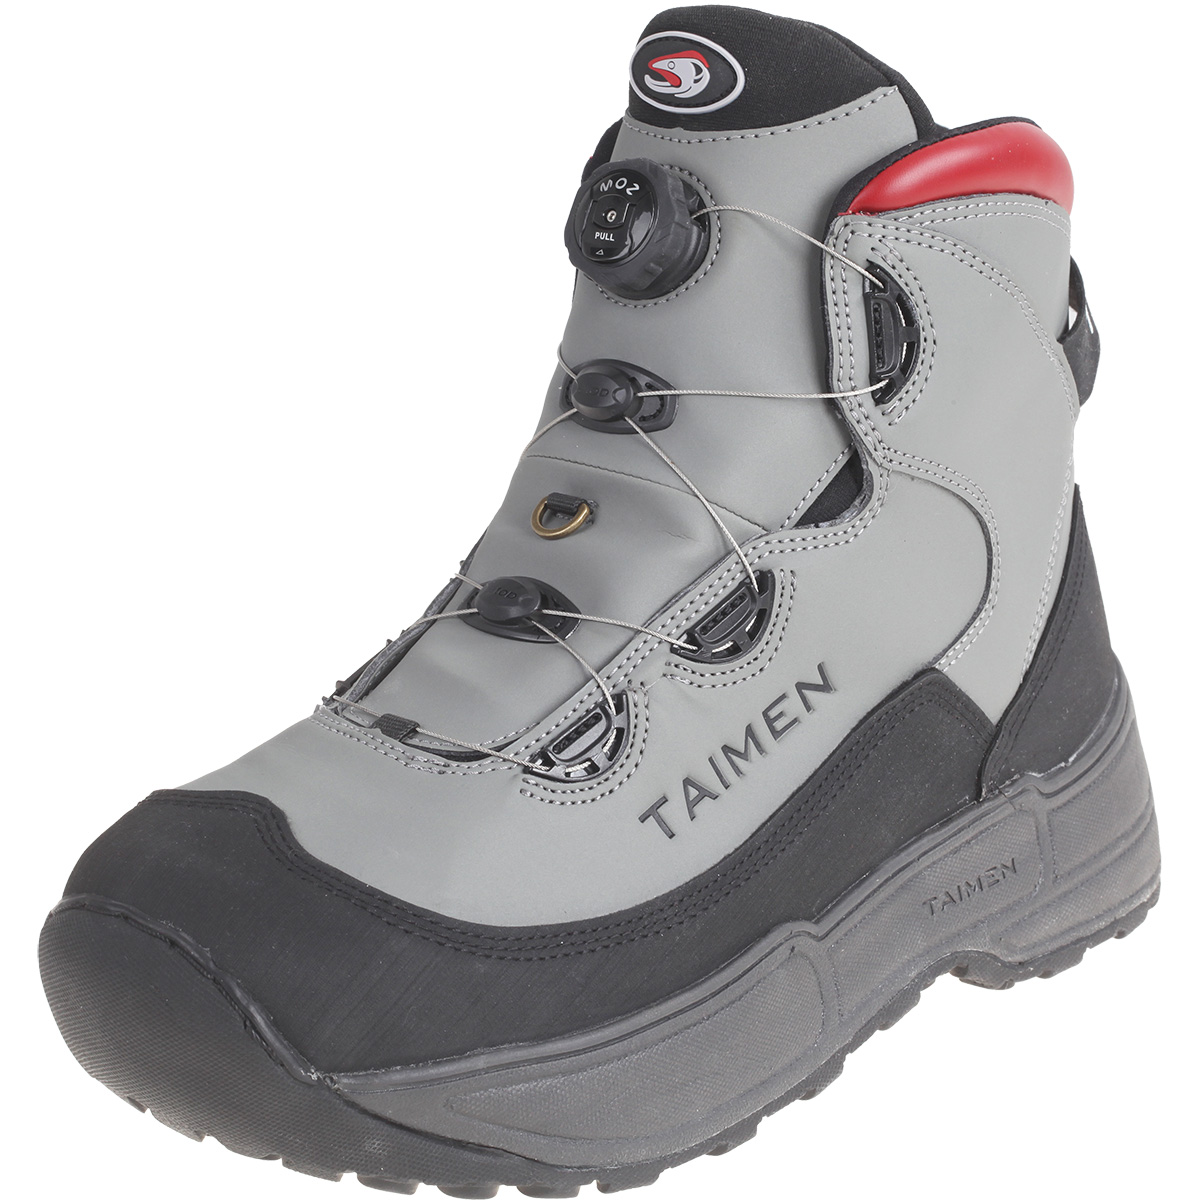 Taimen khatanga wading boots fishing wading boots ebay for Fly fishing wading boots